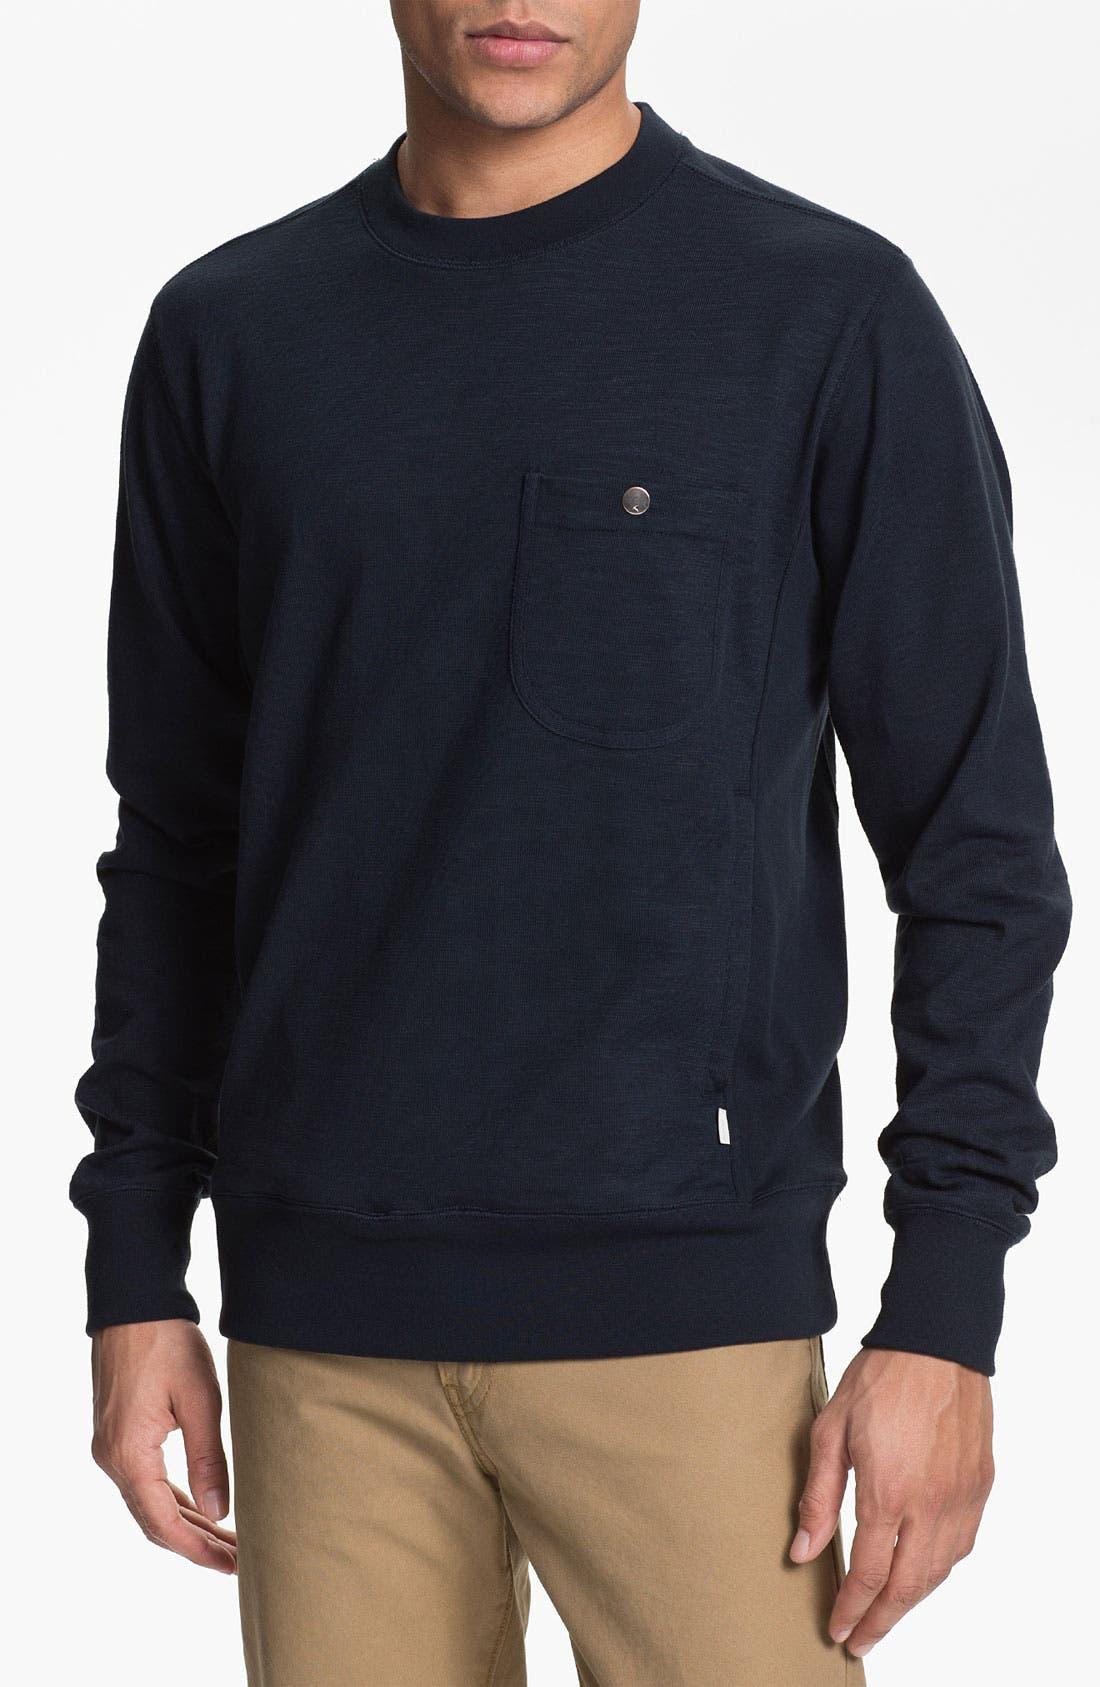 Alternate Image 1 Selected - Burton 'Grafton' Crewneck Sweatshirt